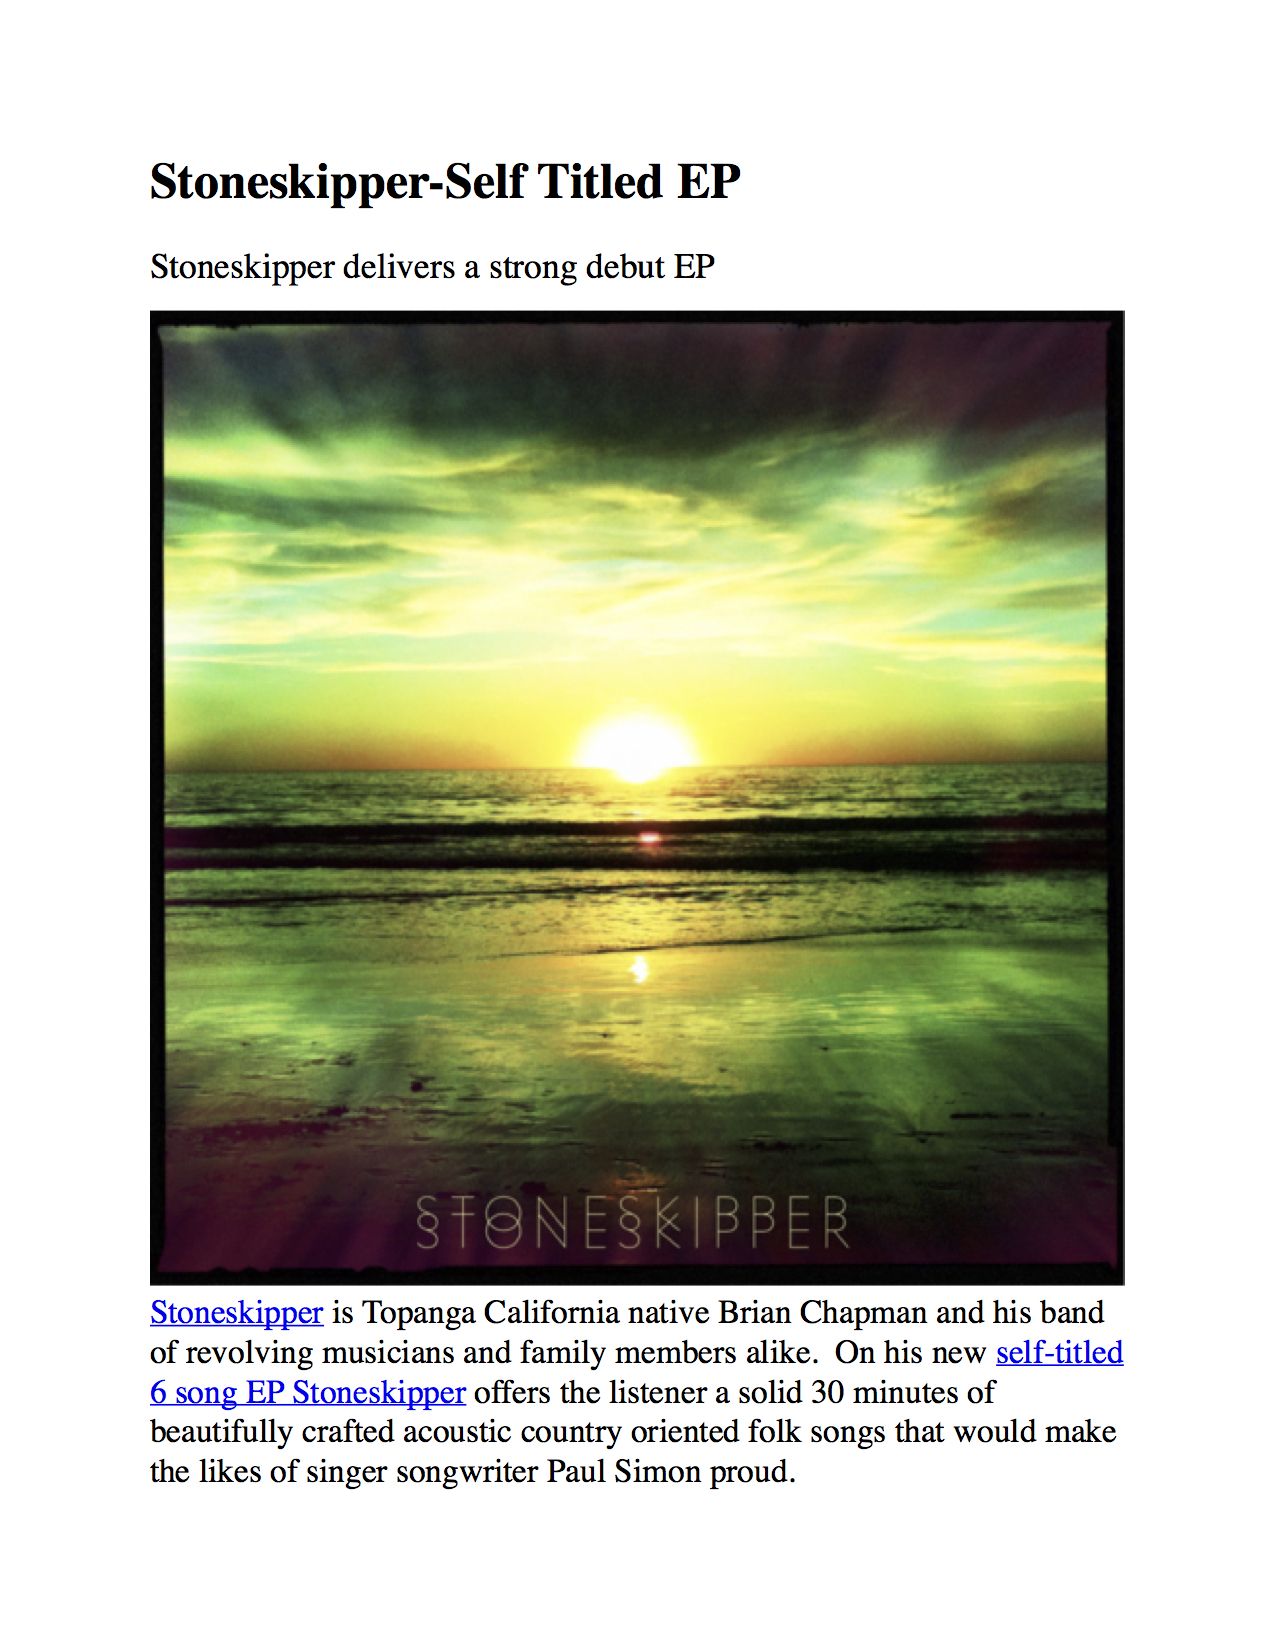 getitonvinyl.com review Jan 2018.jpg